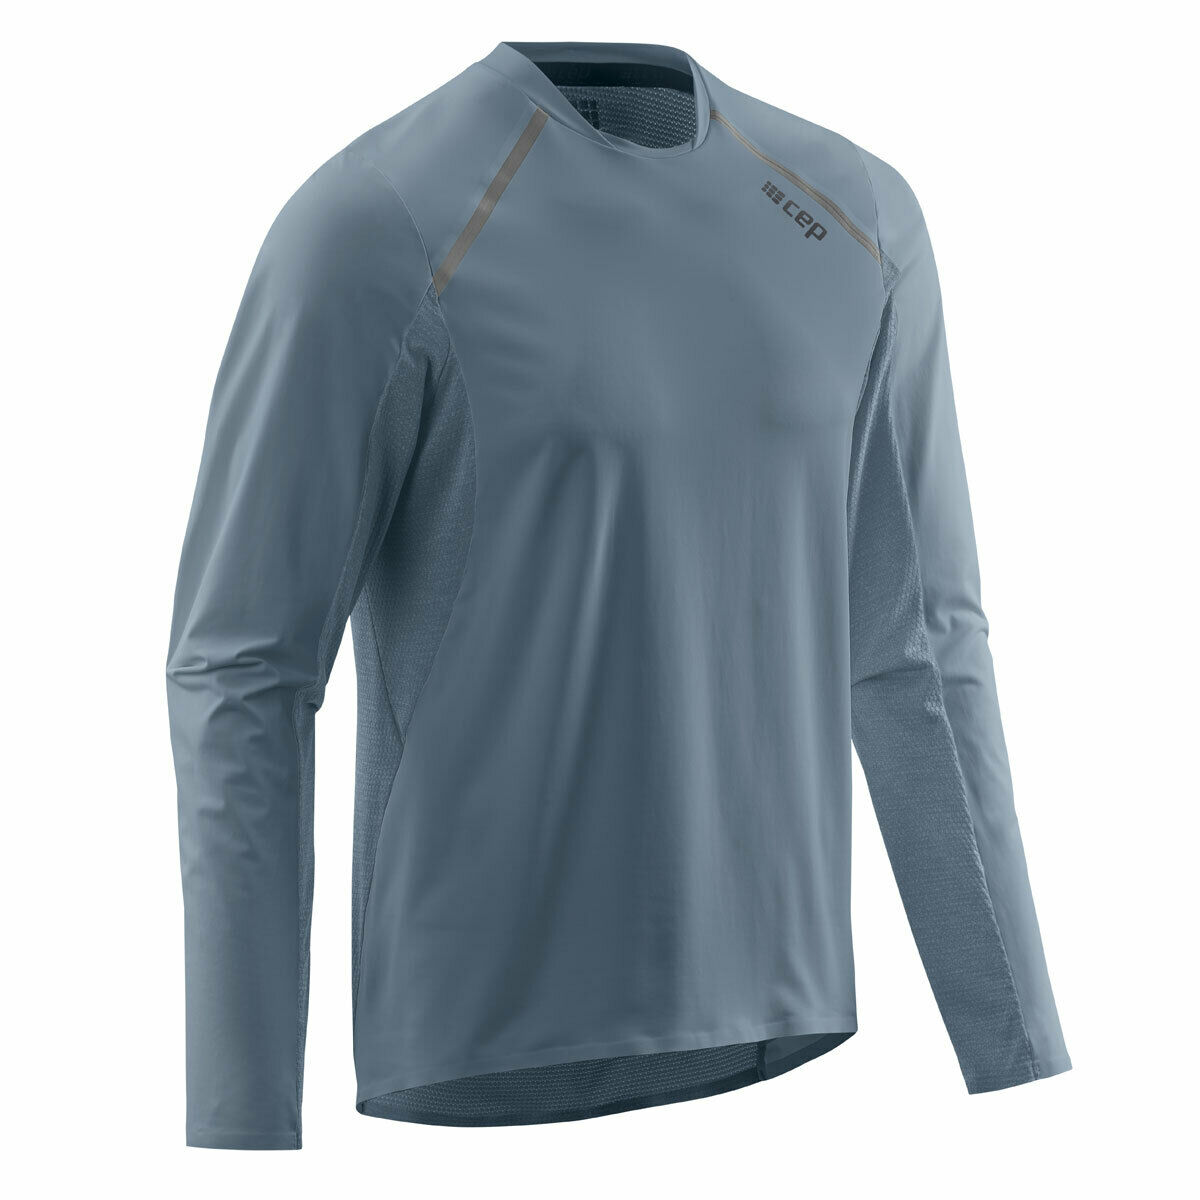 CEP Run SHIRT LONG SLEEVE MEN grigio   w91326 funzione di scorrimento Camicia a maniche lunghe